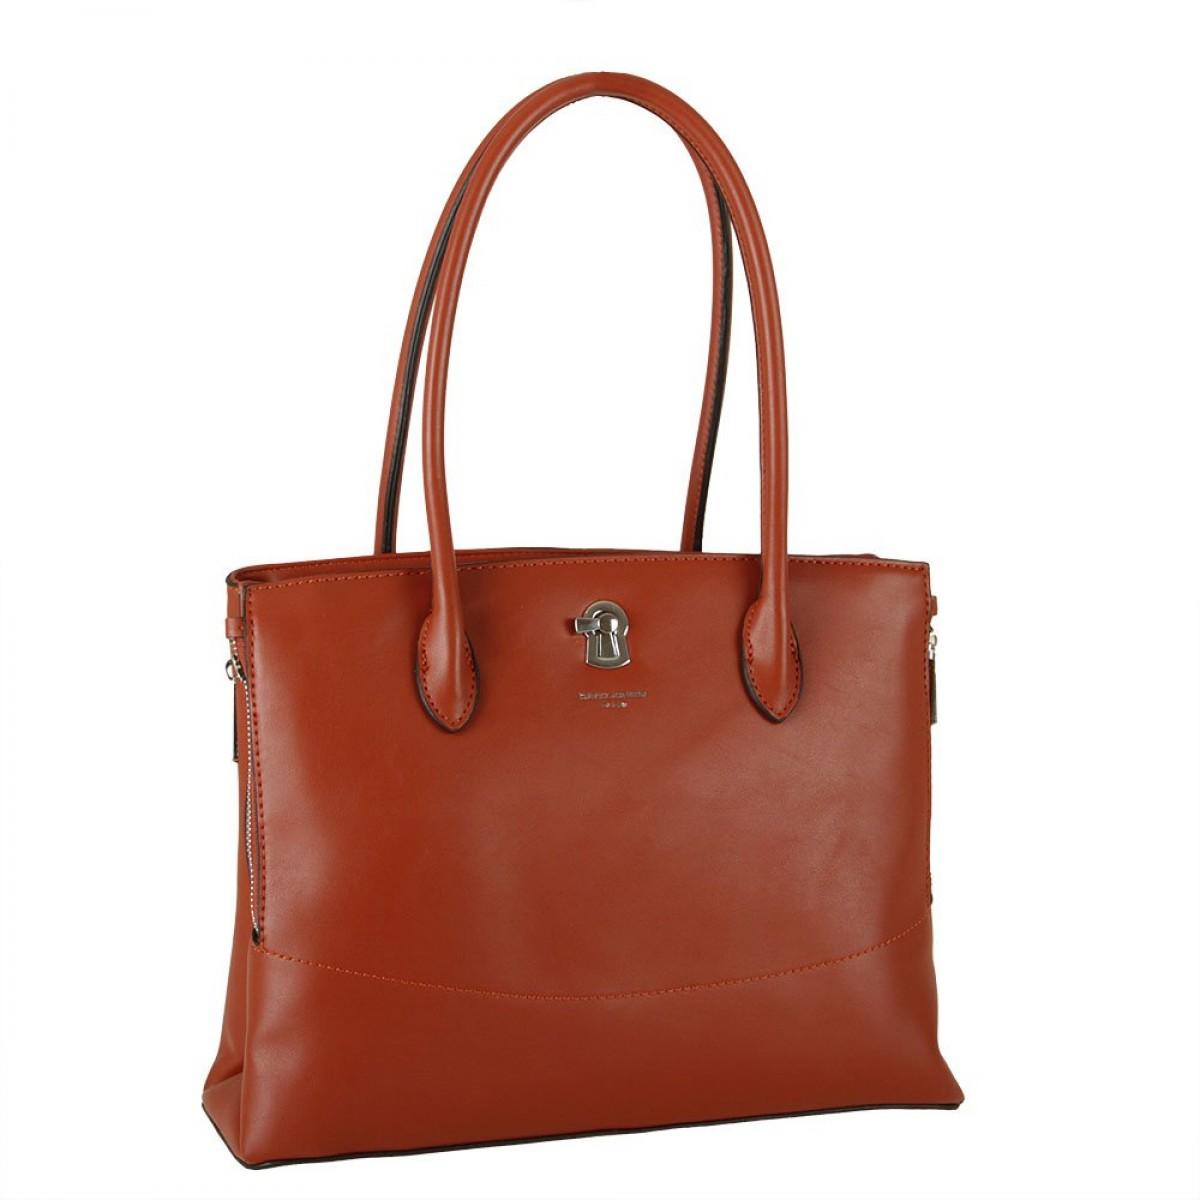 Жіноча сумка David Jones CM5885 SIENNA